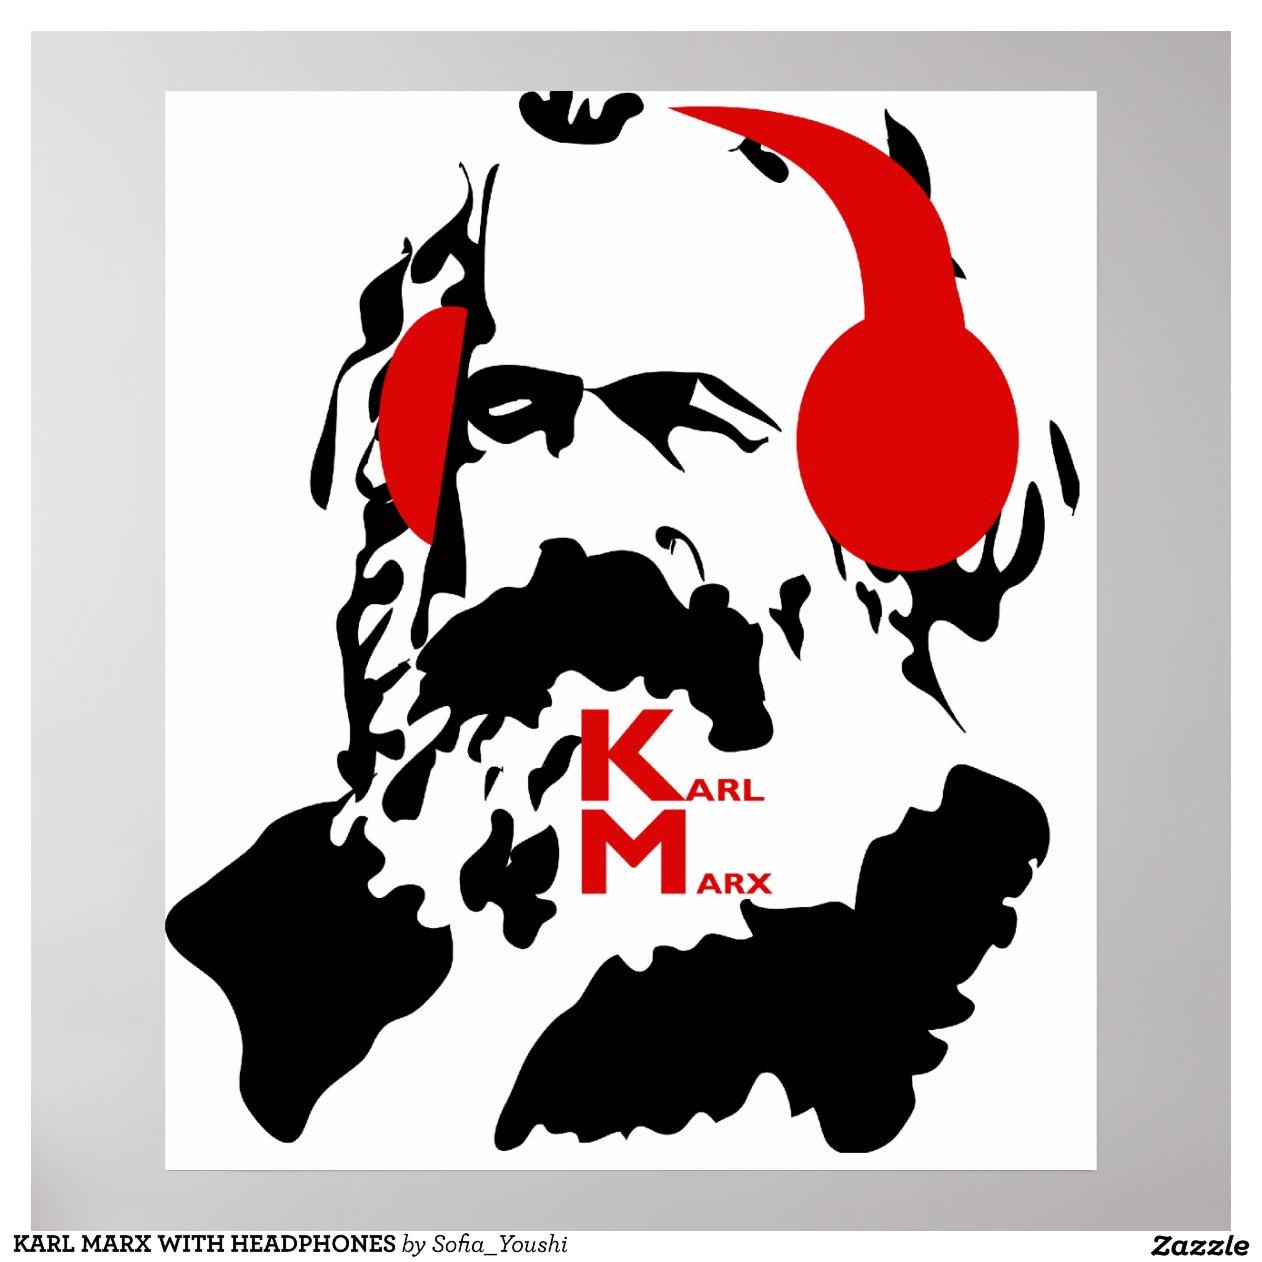 karl marxs views on todays society essay